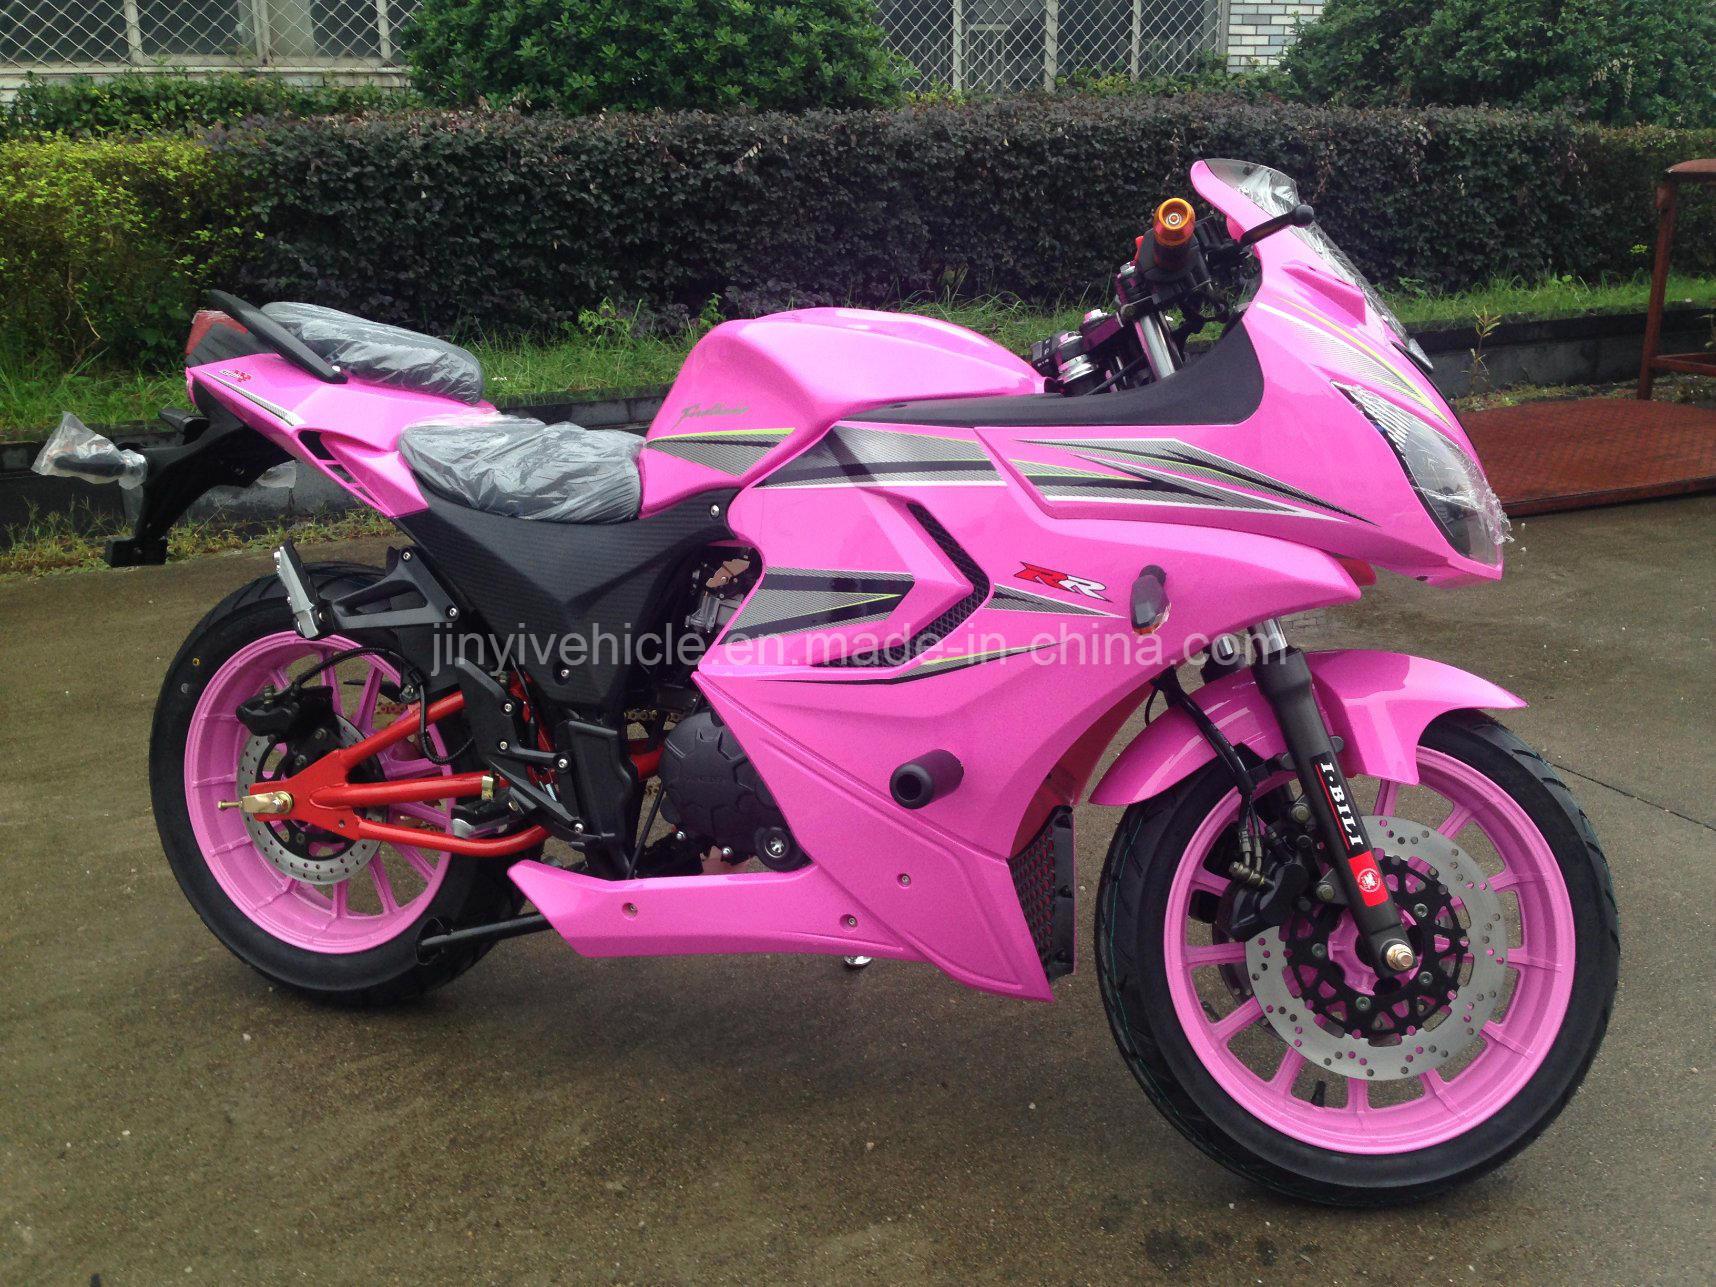 motorcycle pink bike racing motorbike sport speed 200cc 250cc china